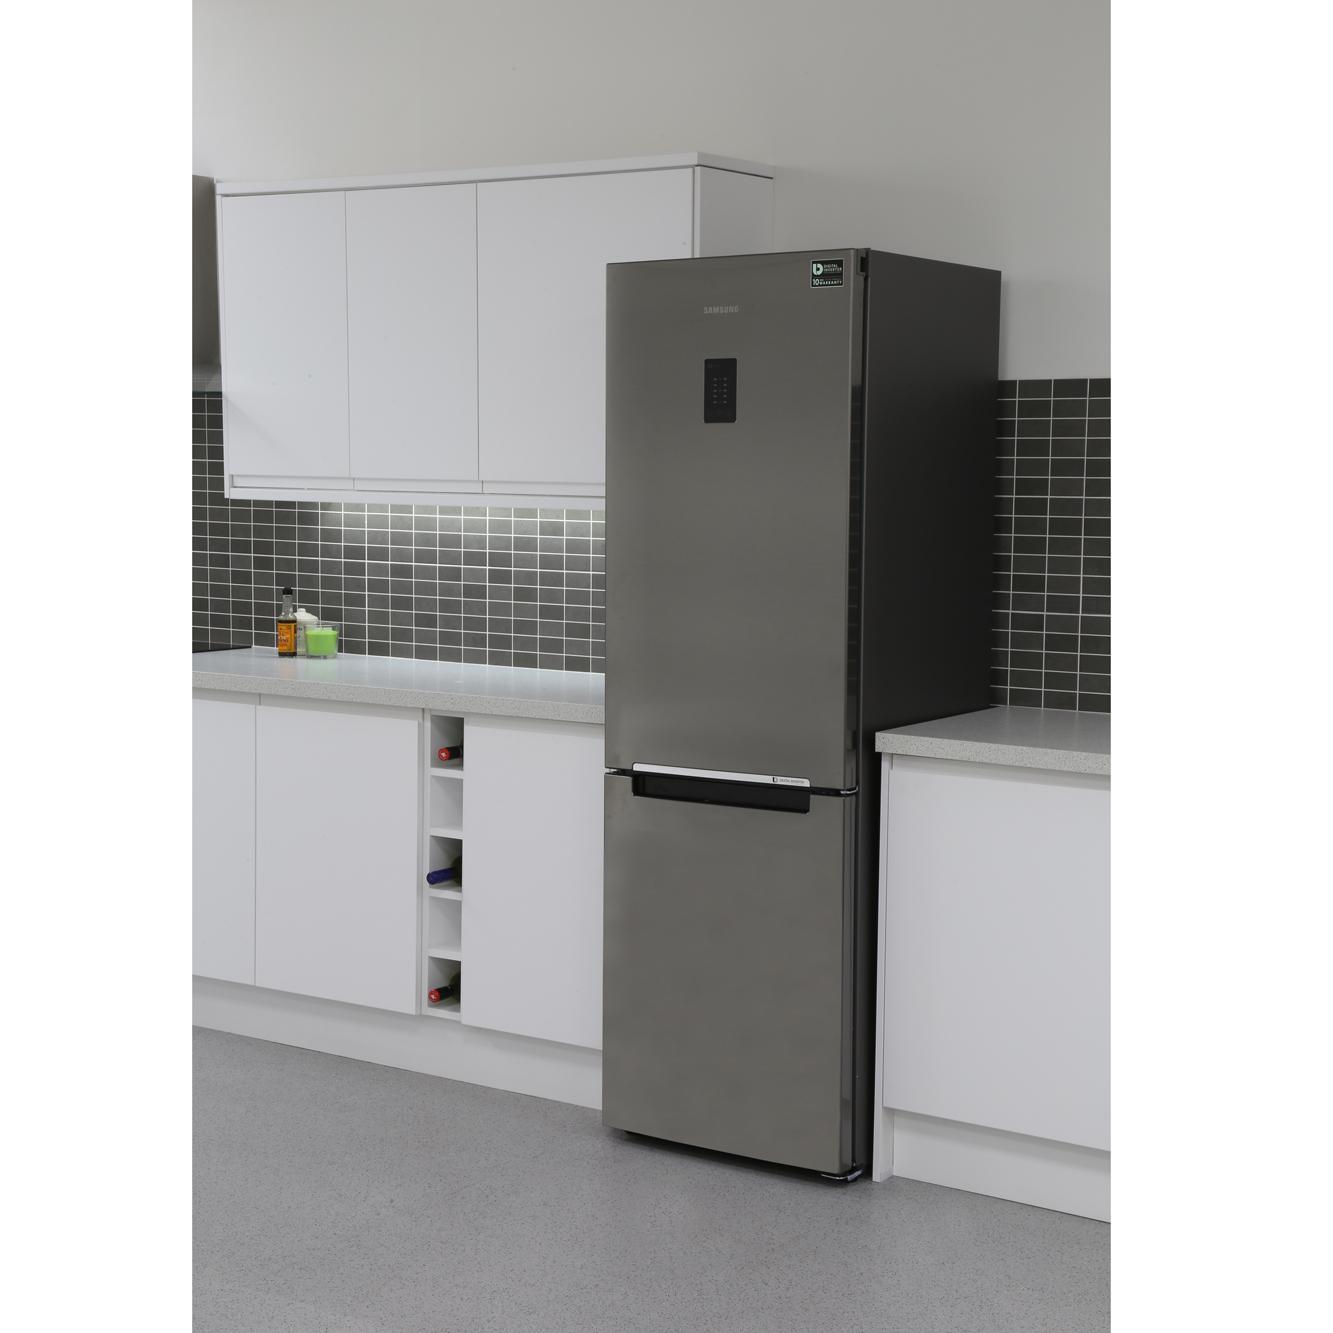 samsung fridge freezer rb31fernbss manual